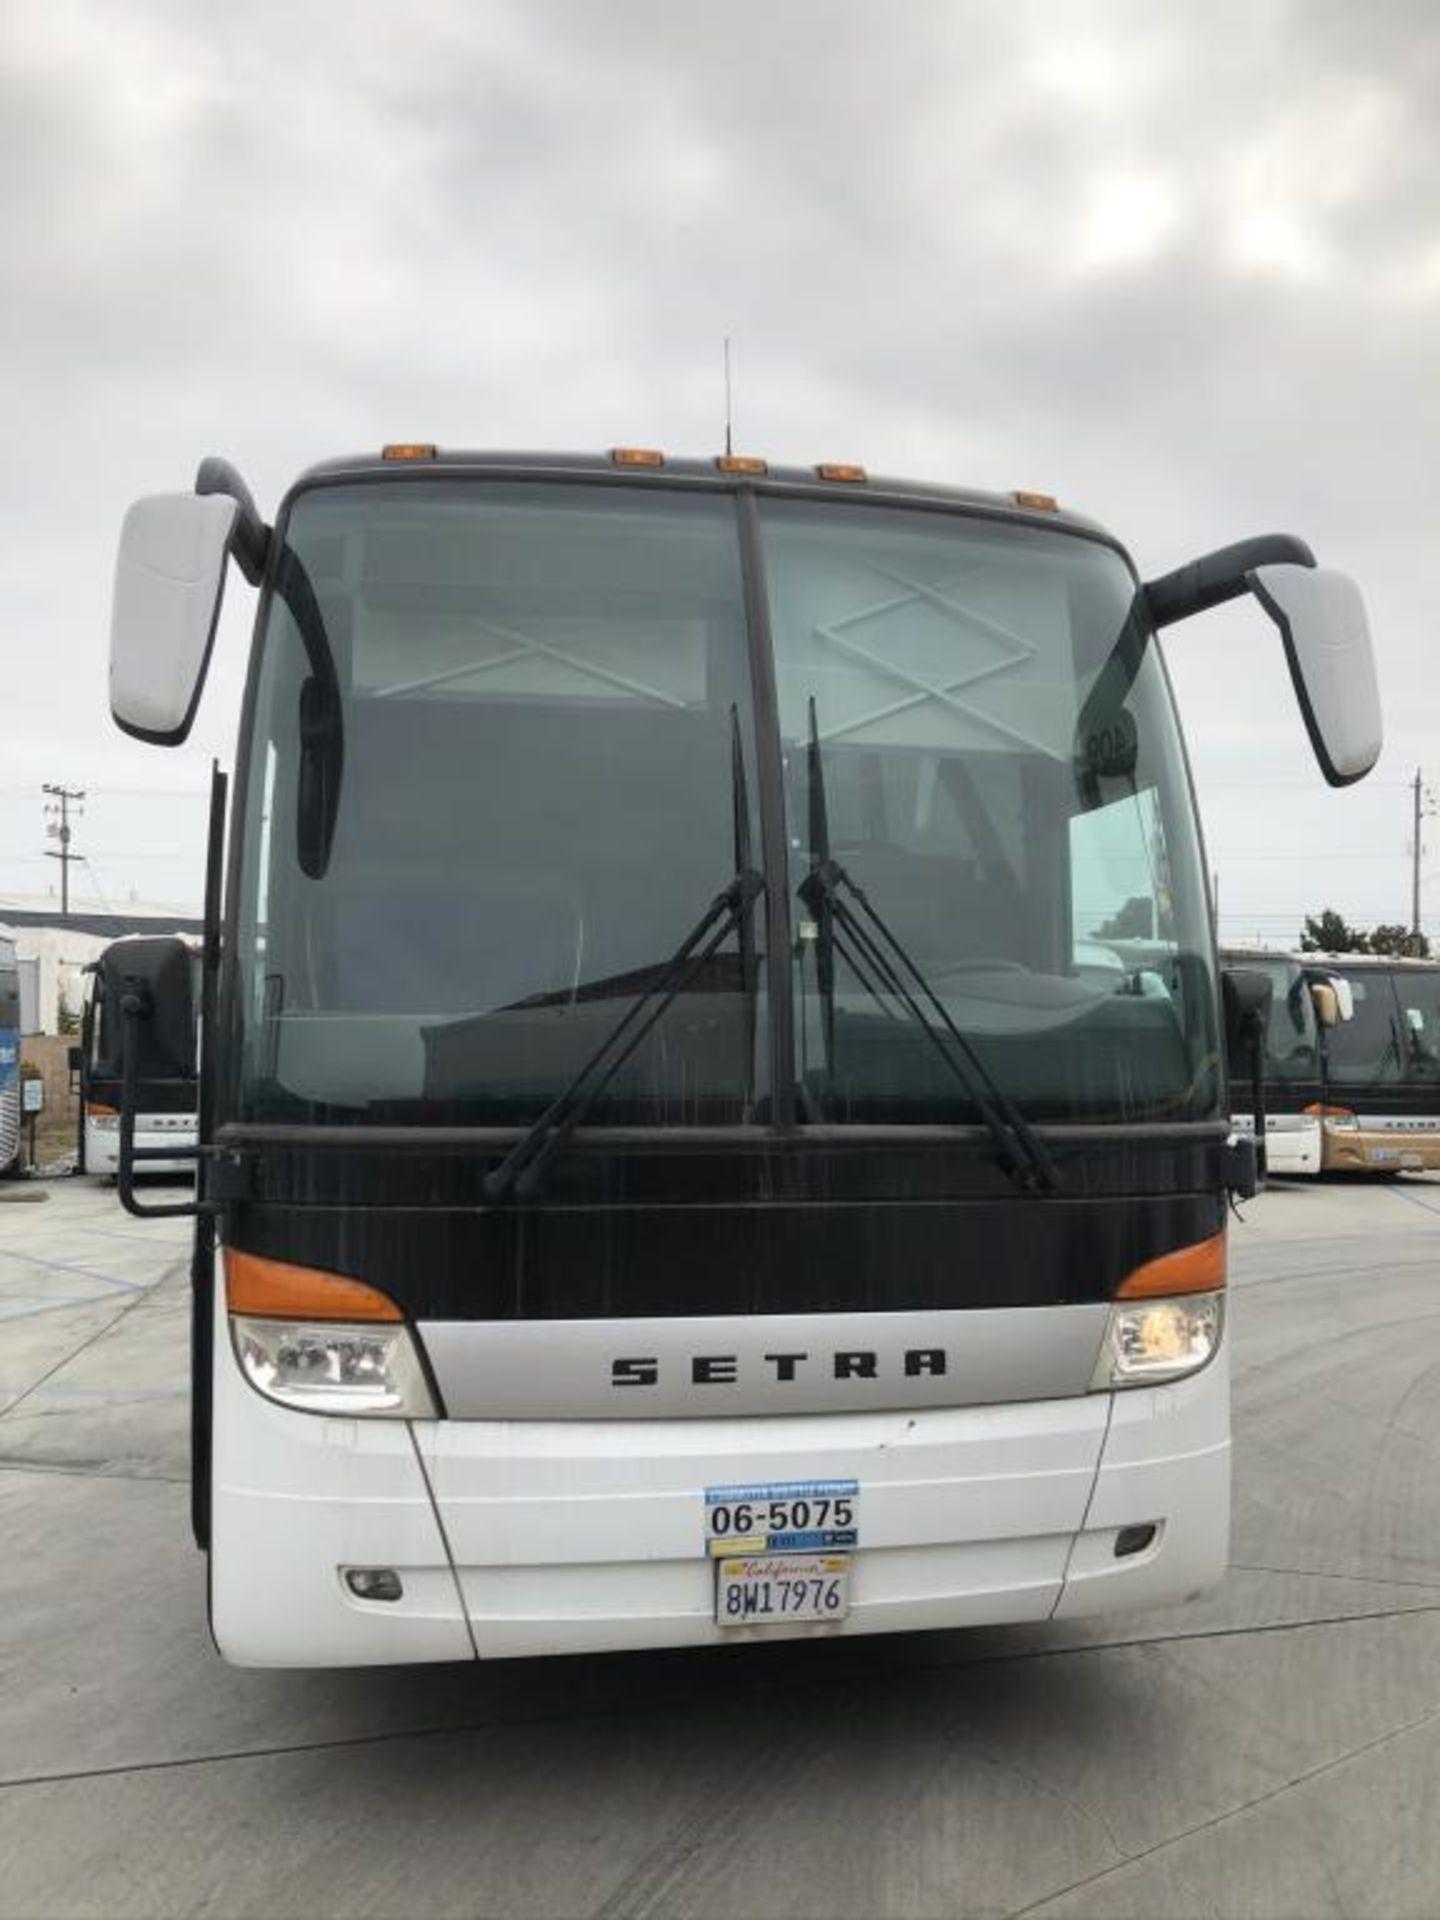 Motor Coach - Image 3 of 18